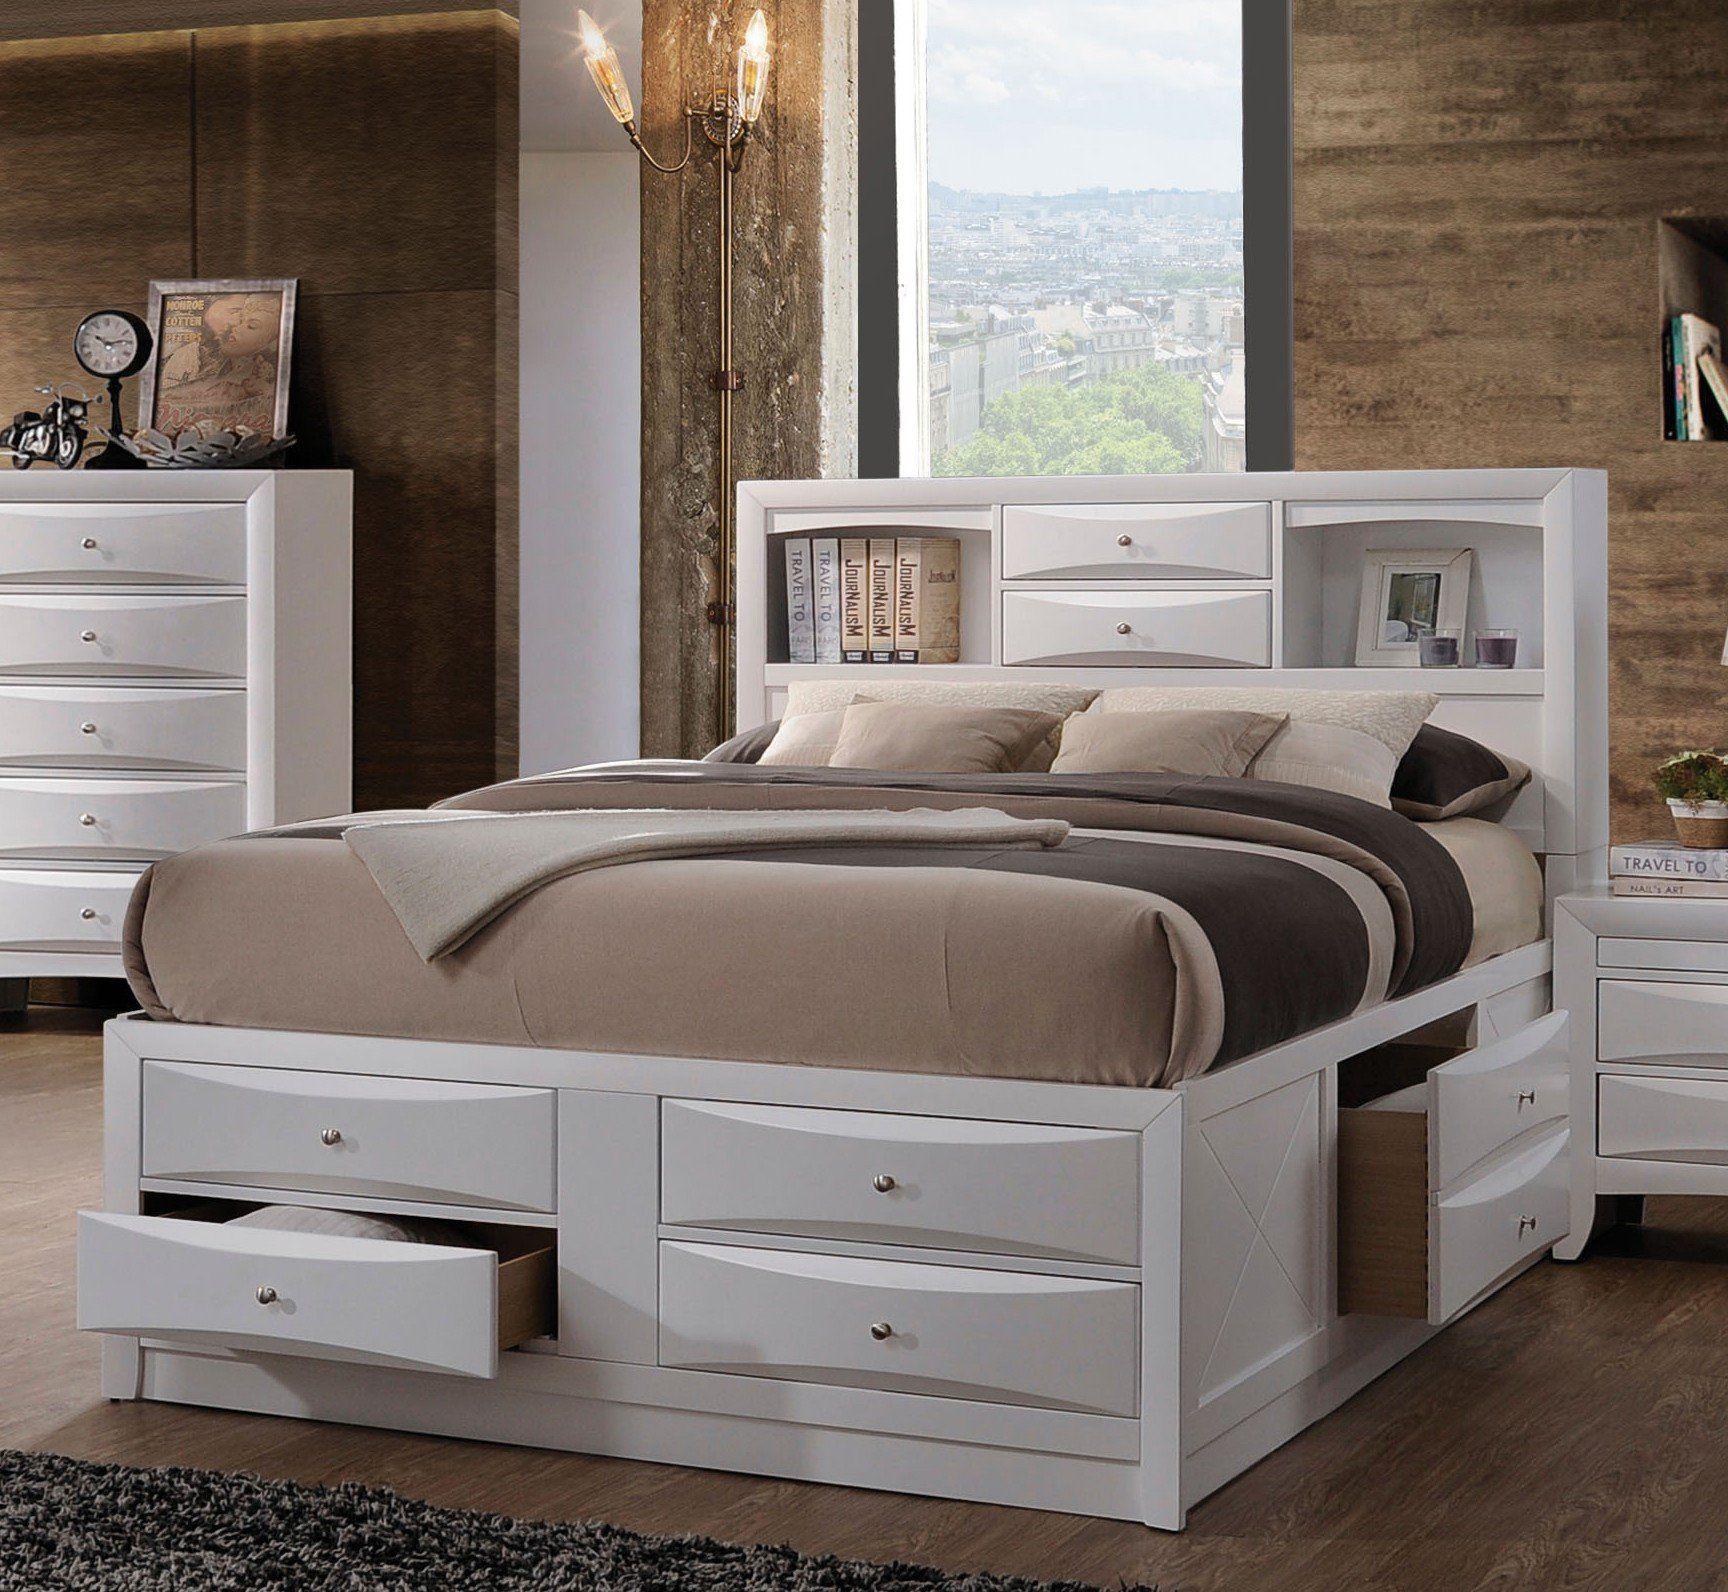 ACME Ireland Storage Eastern King Bed w/Storage White